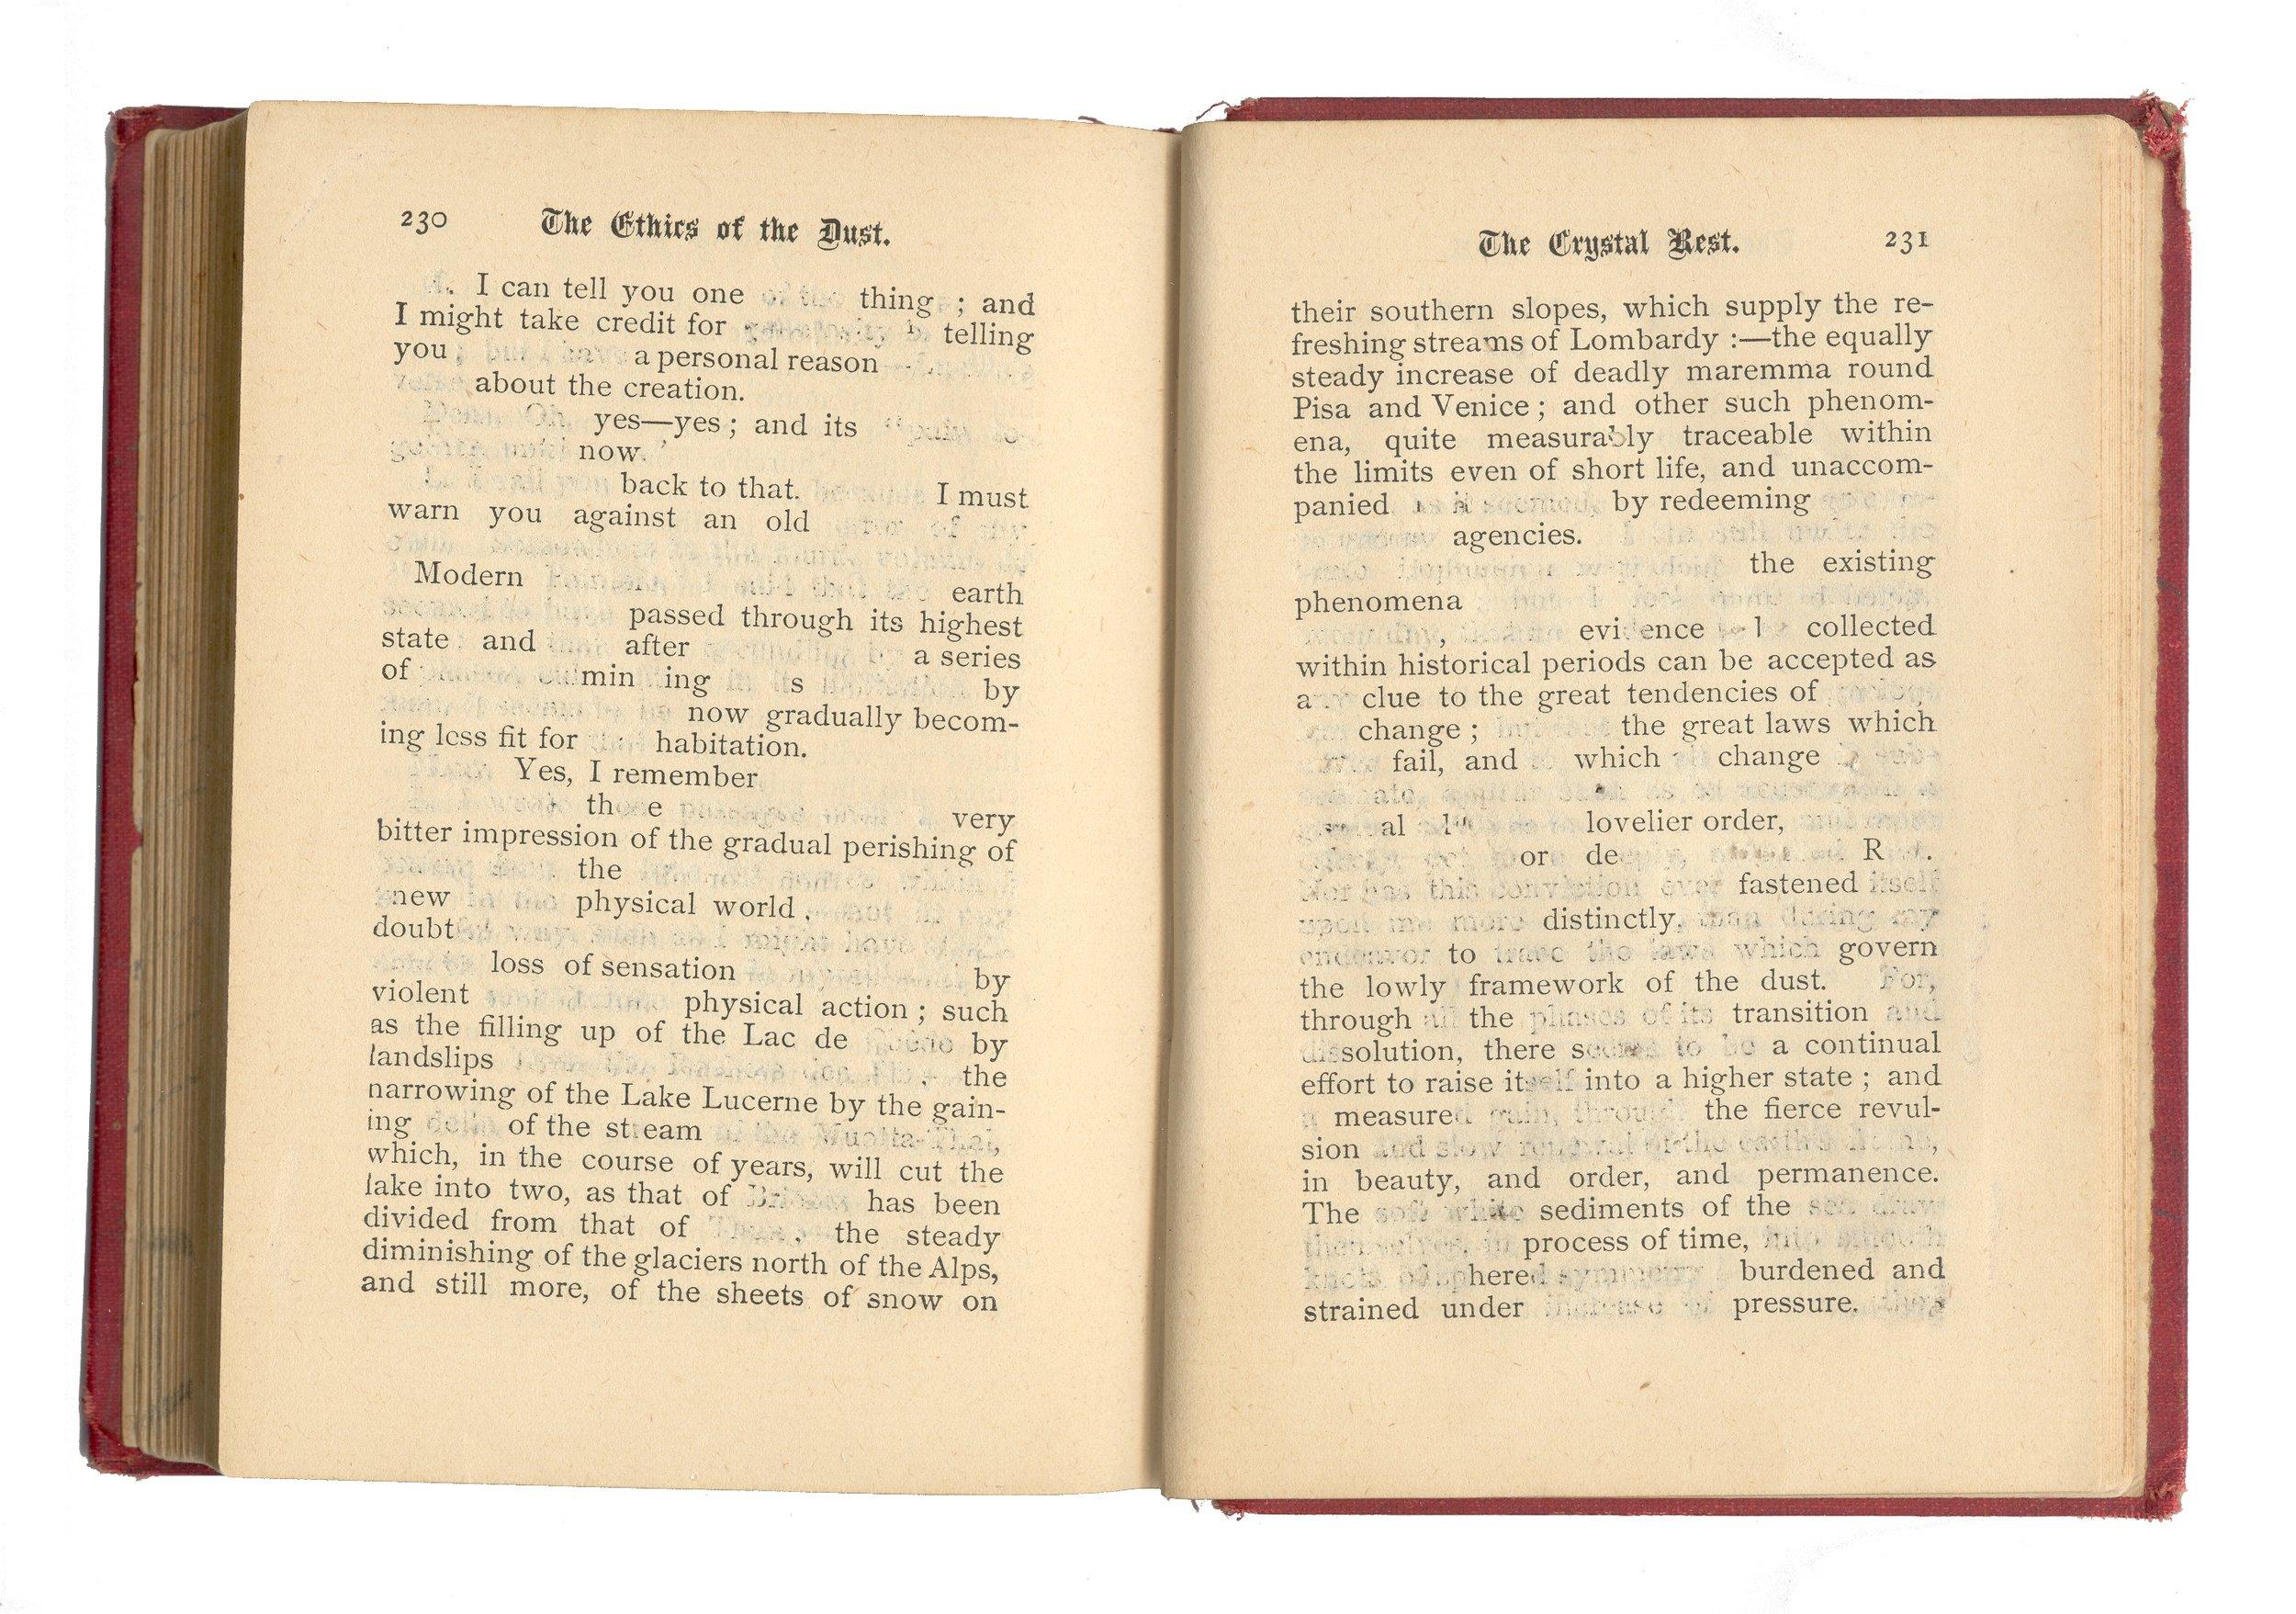 JorgeOteroPailos-Scraping-Ruskin-Book-5&6-WebOptimized.jpg